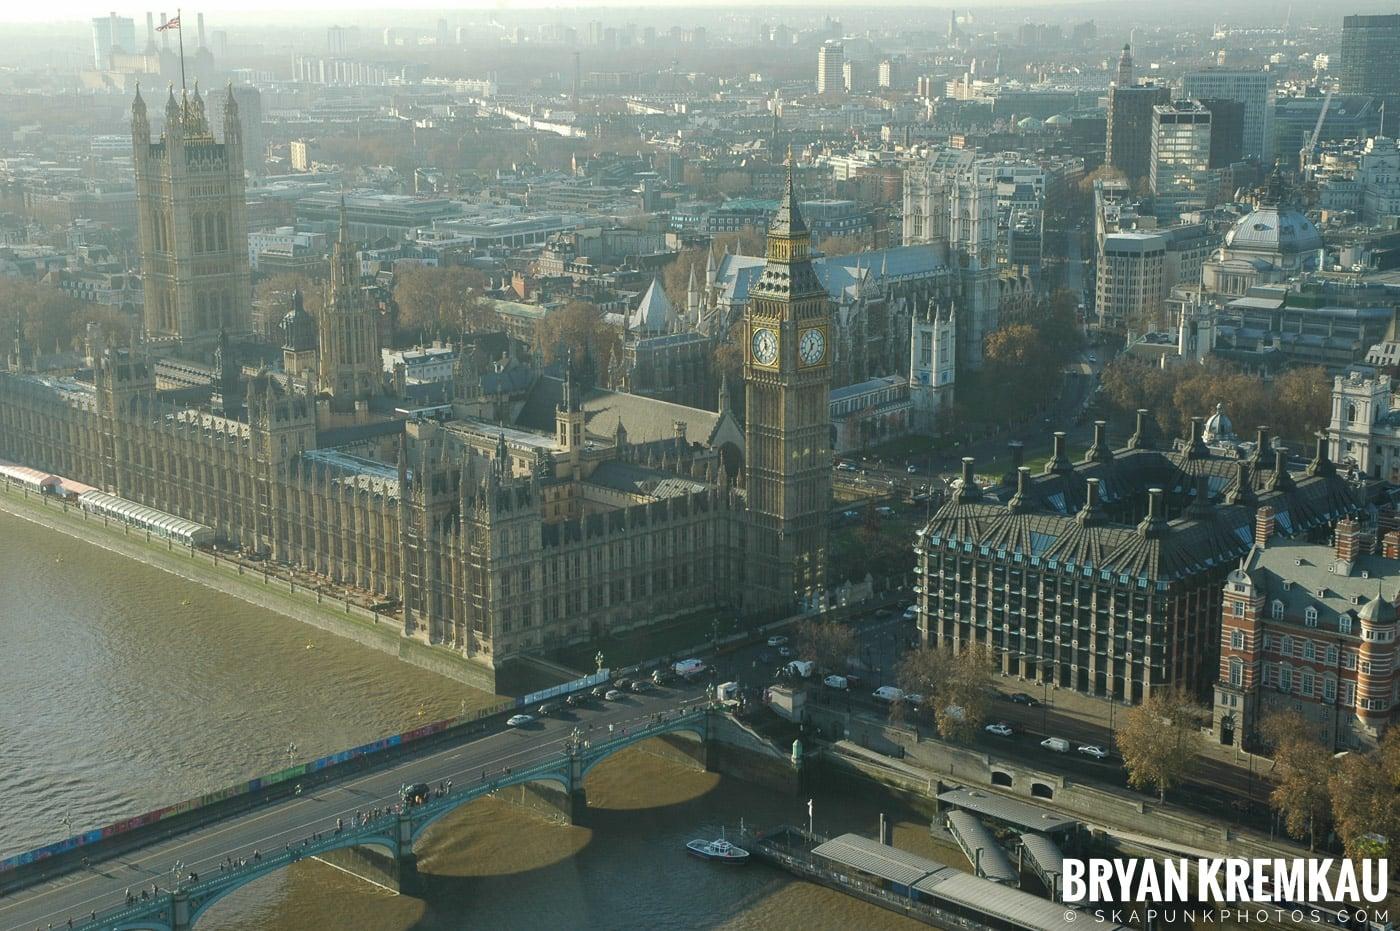 London, England - Day 4 - 12.19.05 (31)